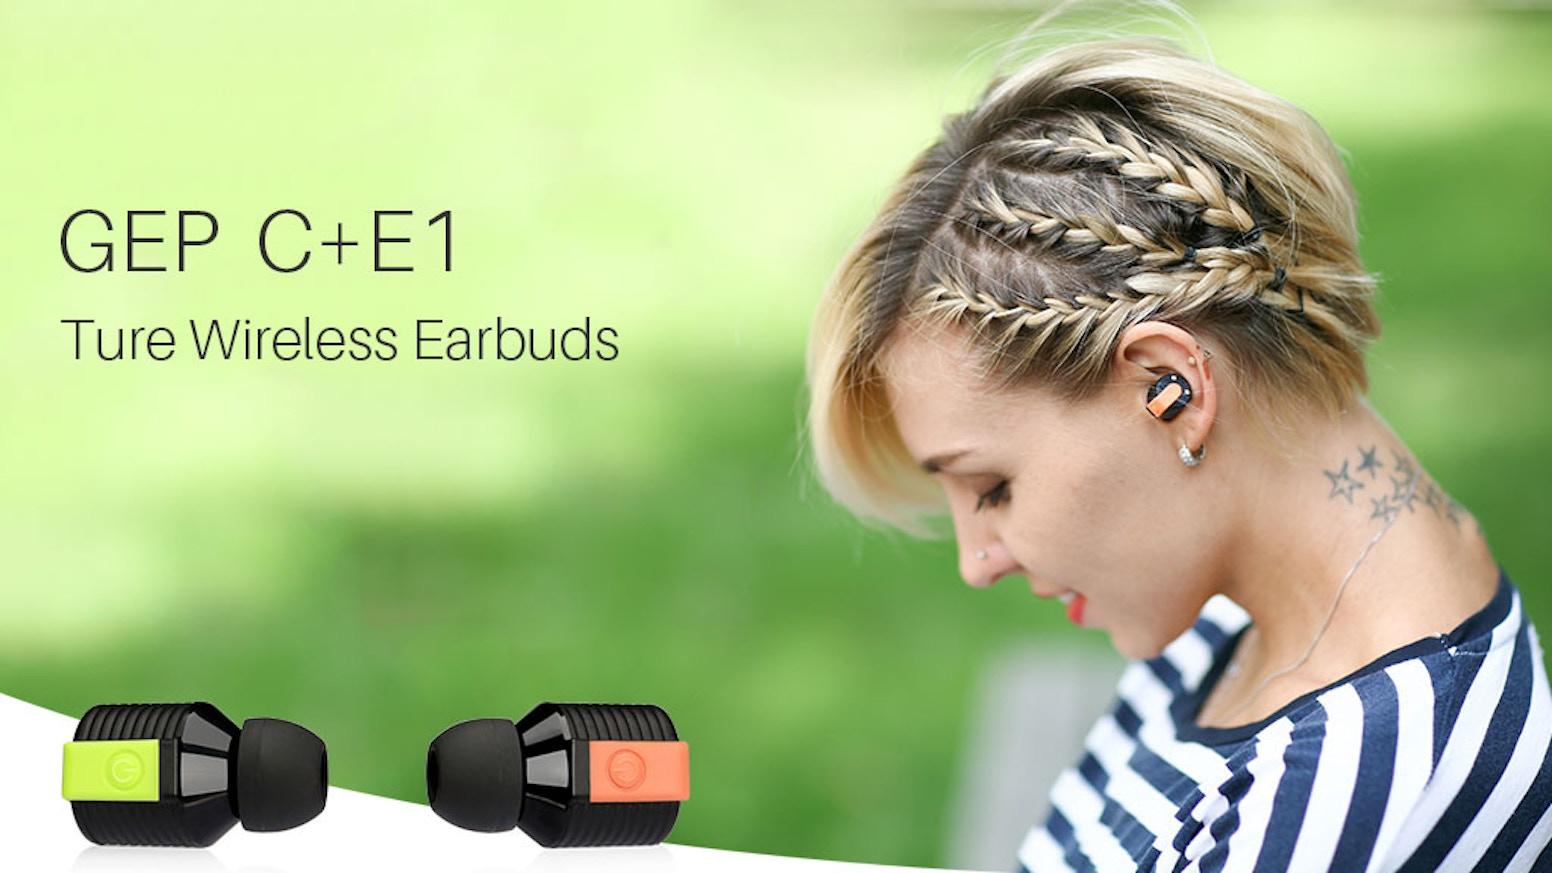 True wireless | Sweatproof&waterproof | Intelligent charging capsule | Stereo technology with heavy bass effect | Effortless setup